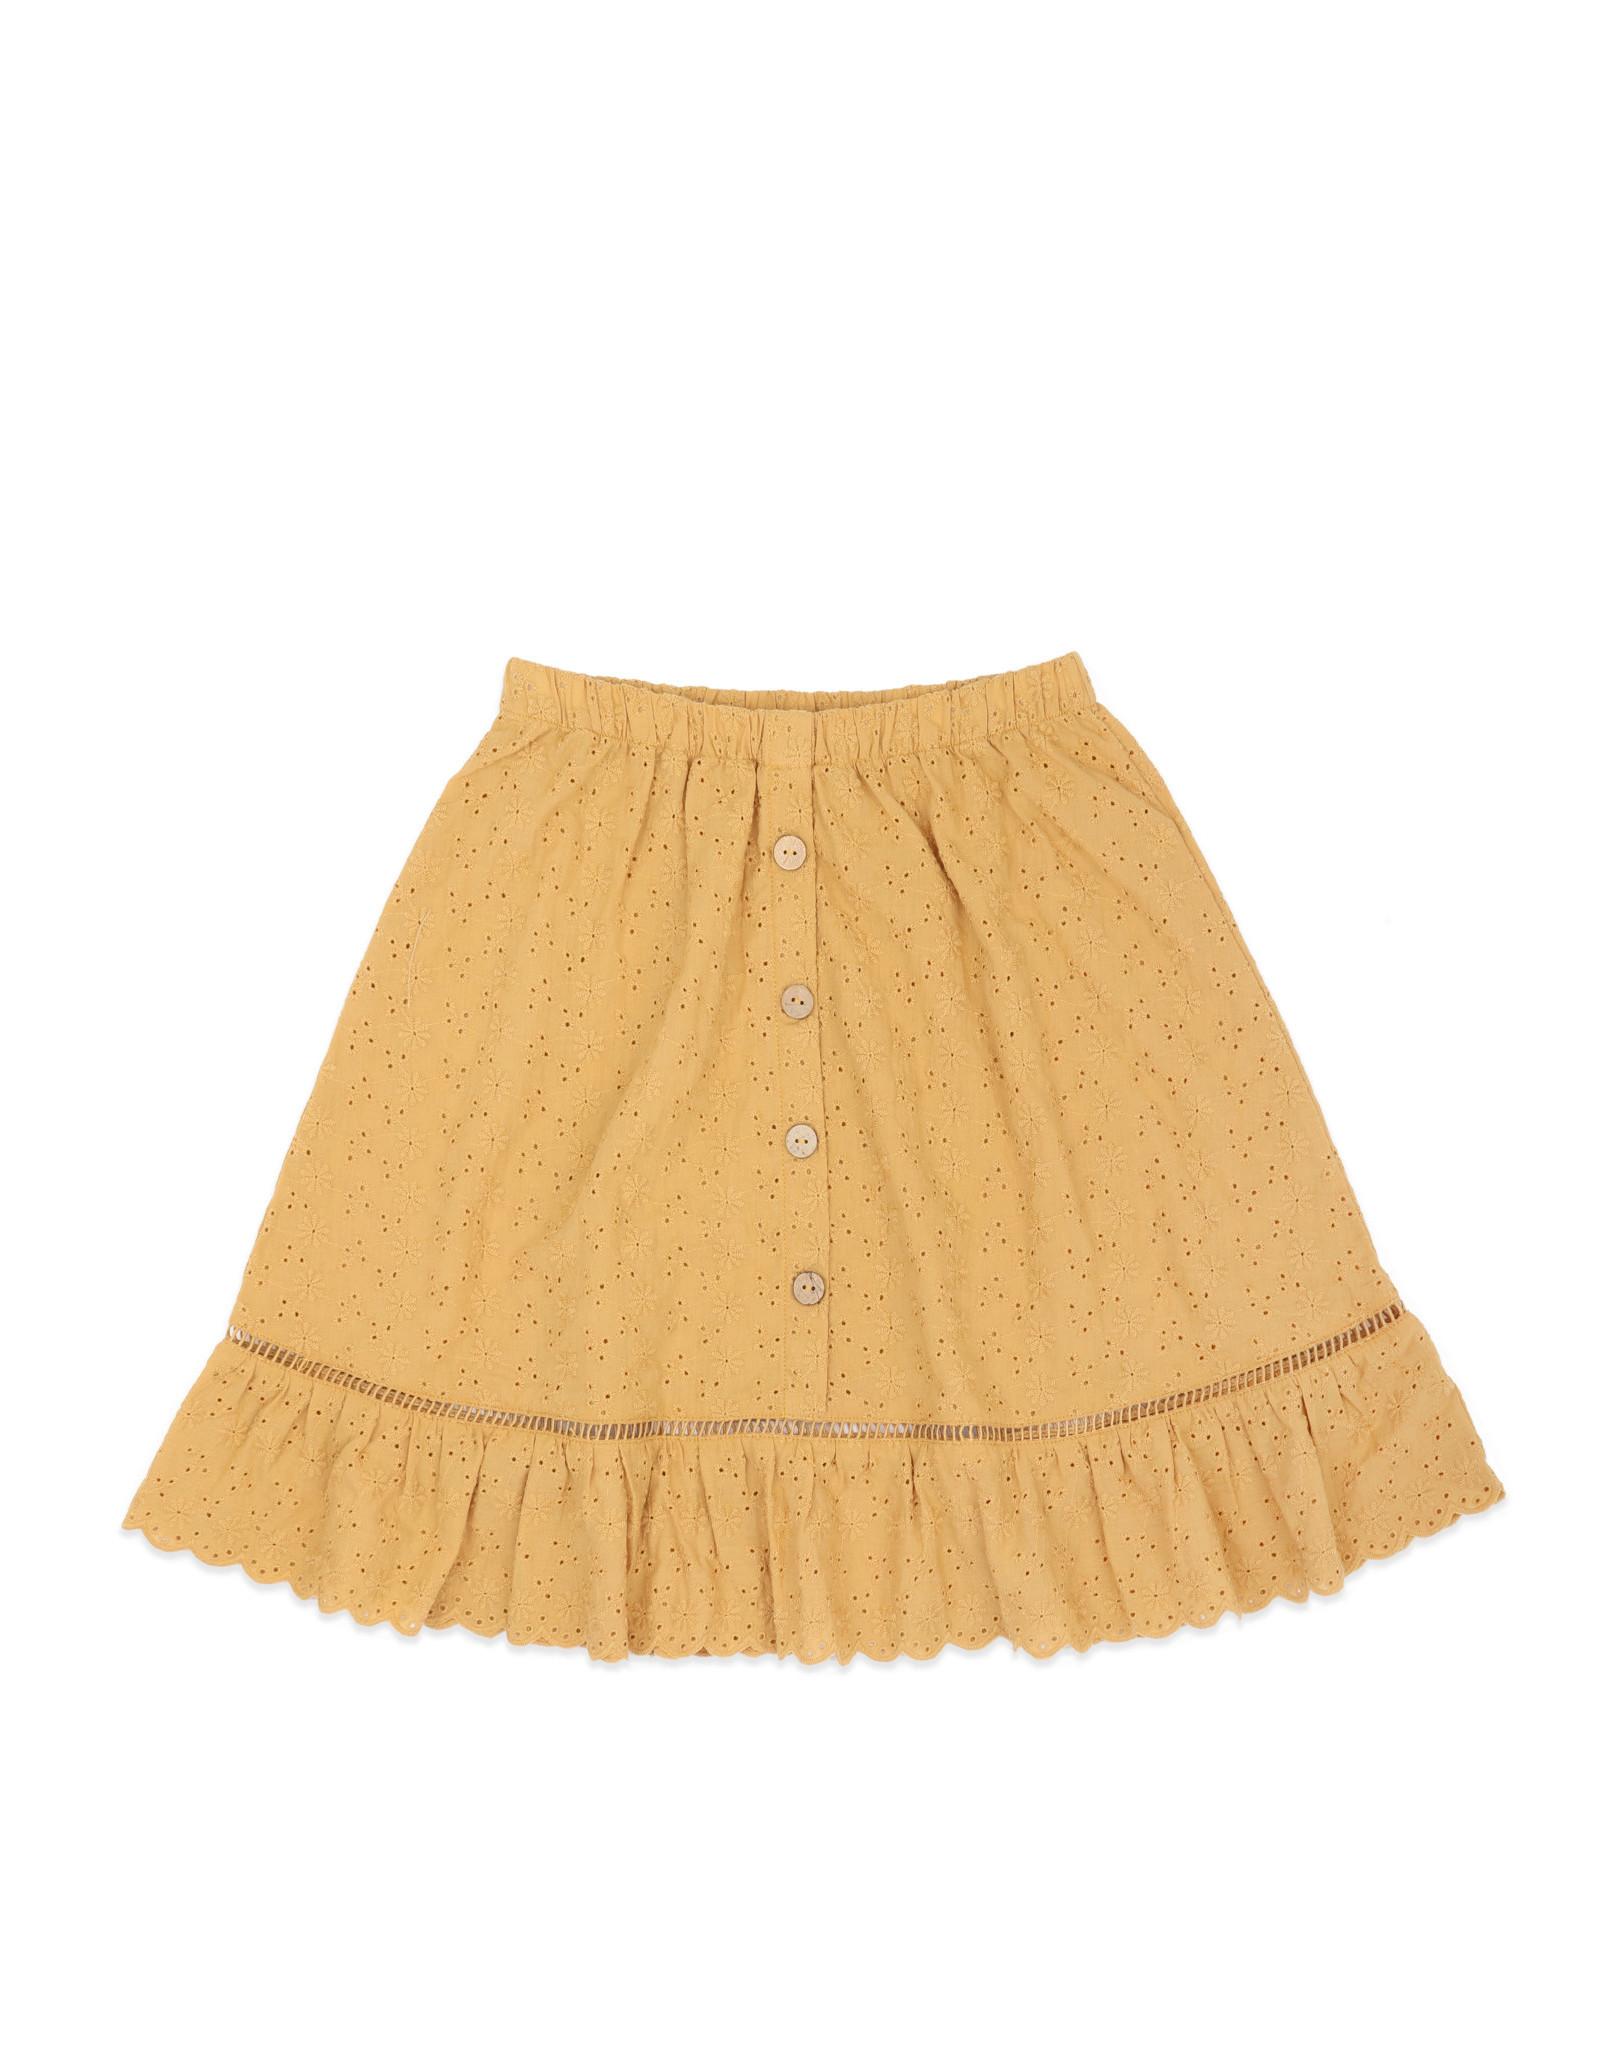 Ammehoela Skirt Romy Mustard Yellow